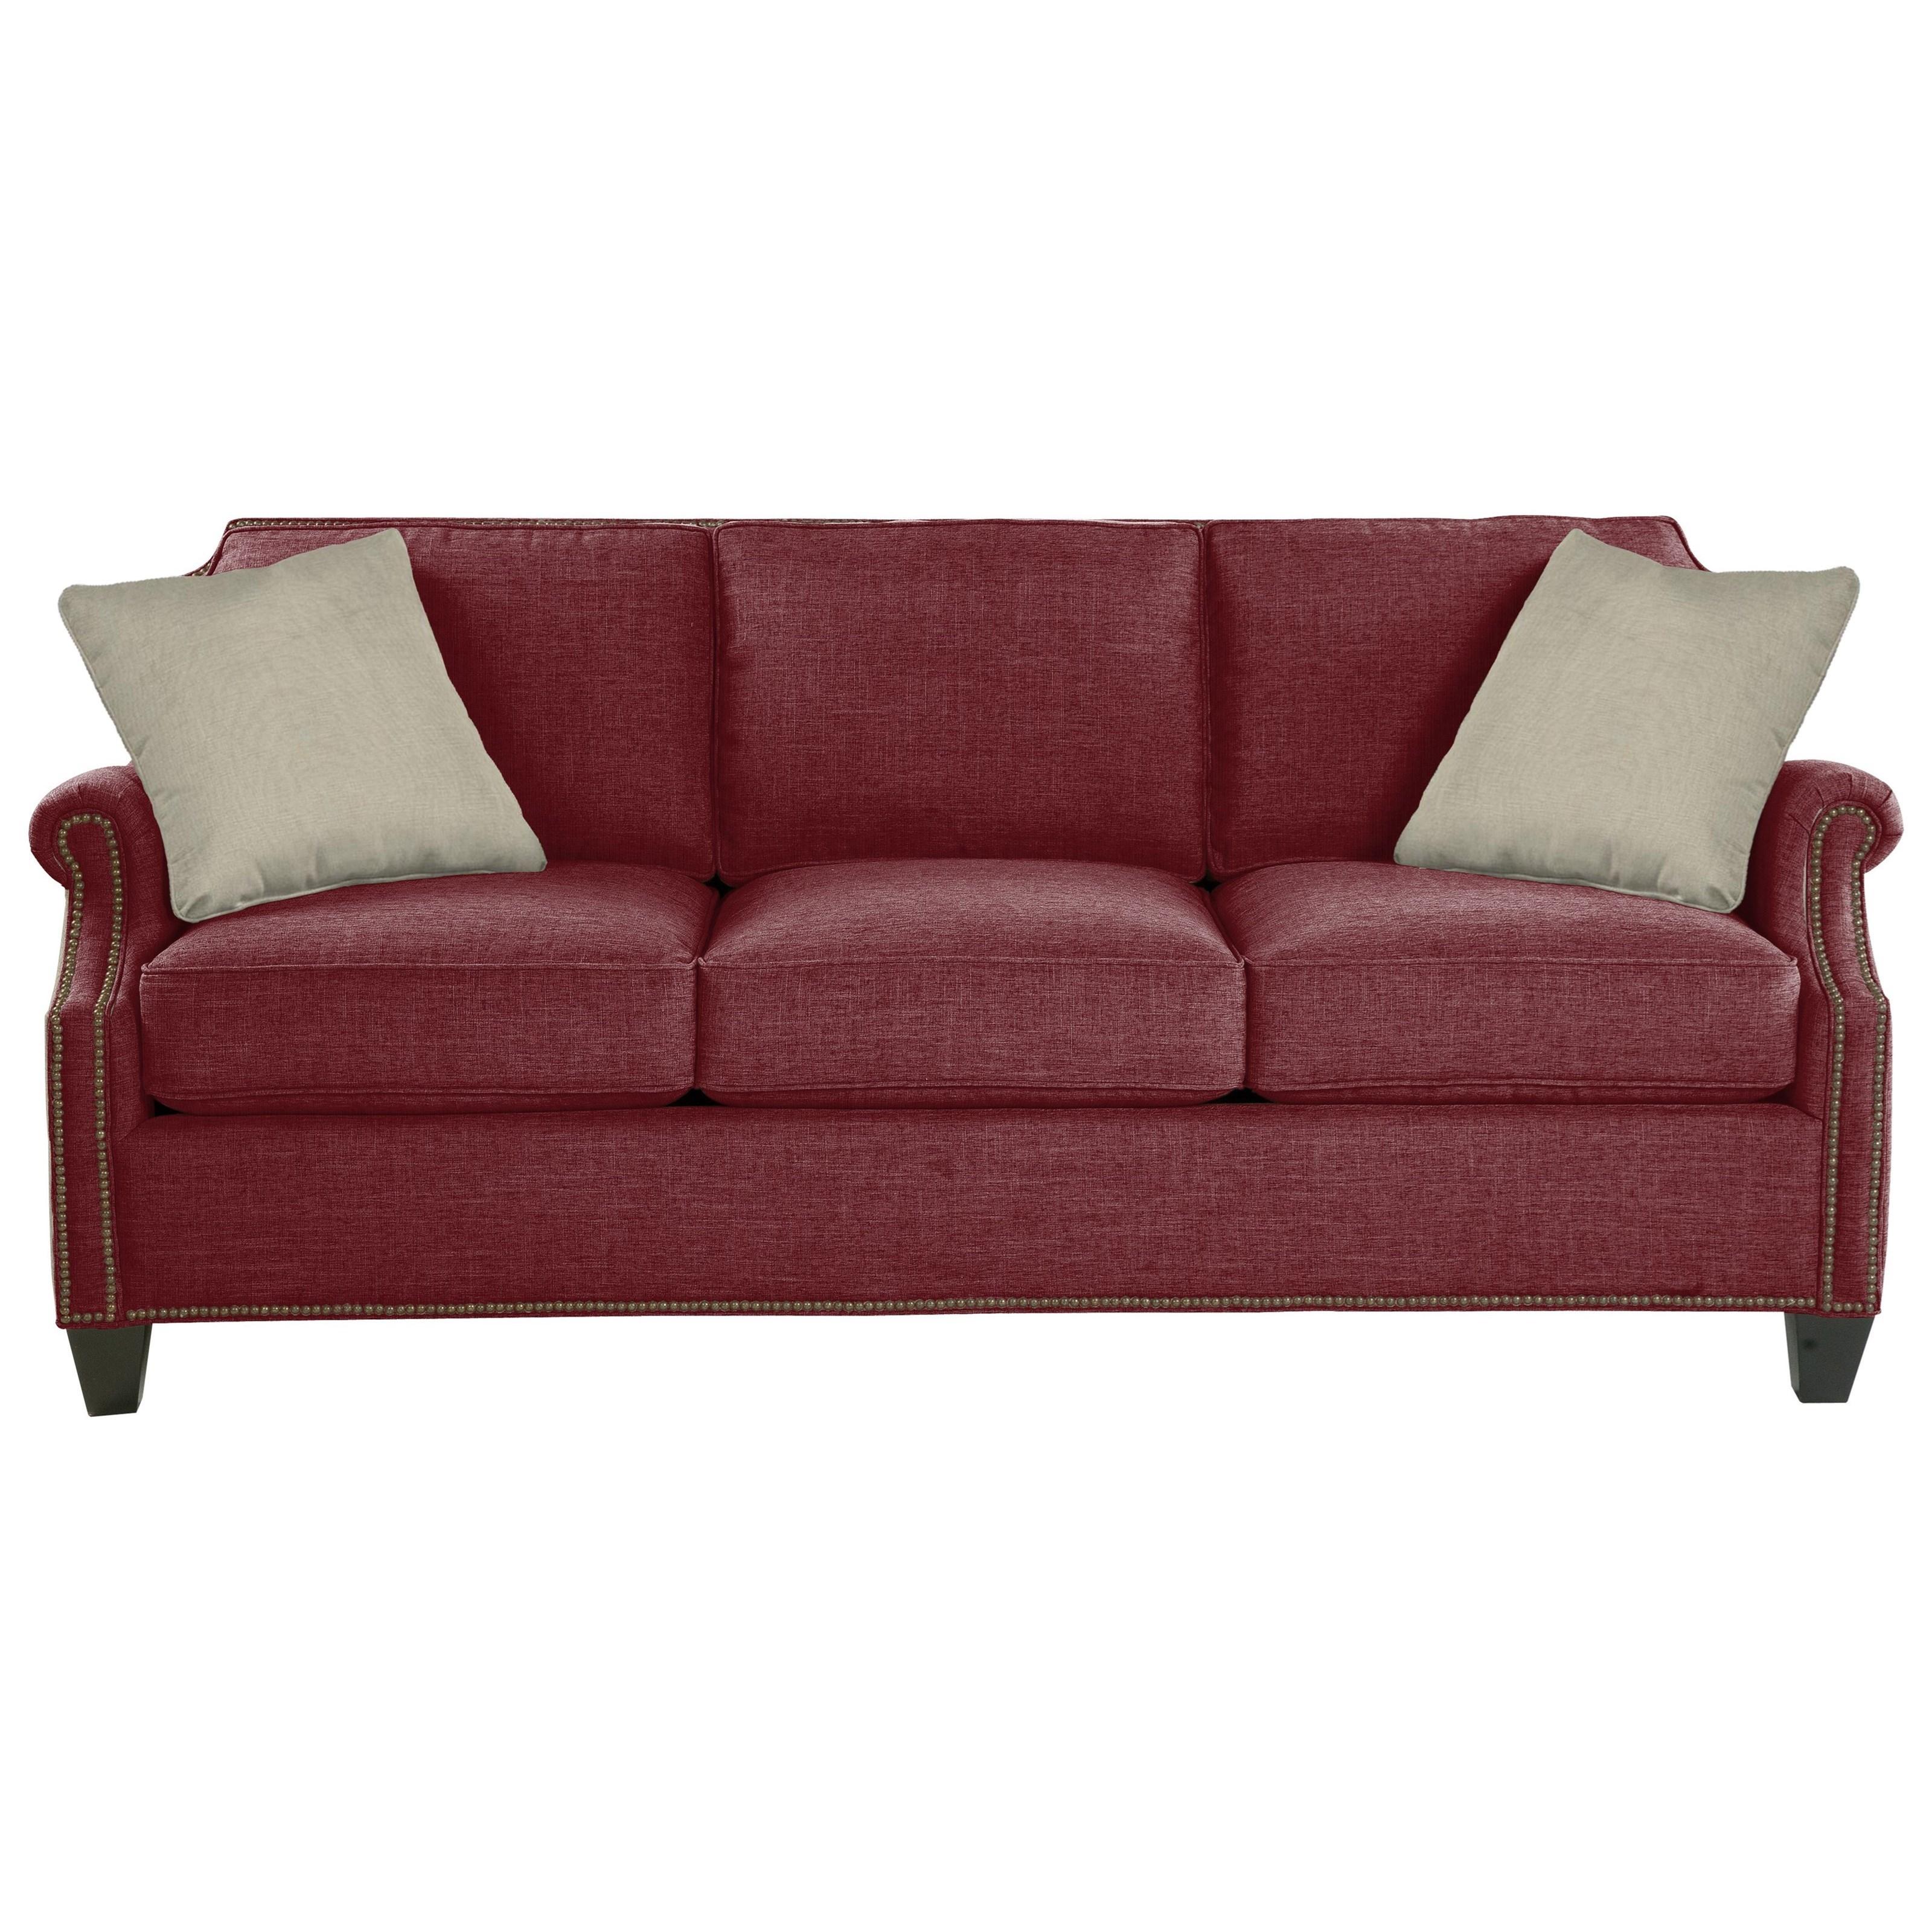 9383 Sofa by Craftmaster at Dunk & Bright Furniture